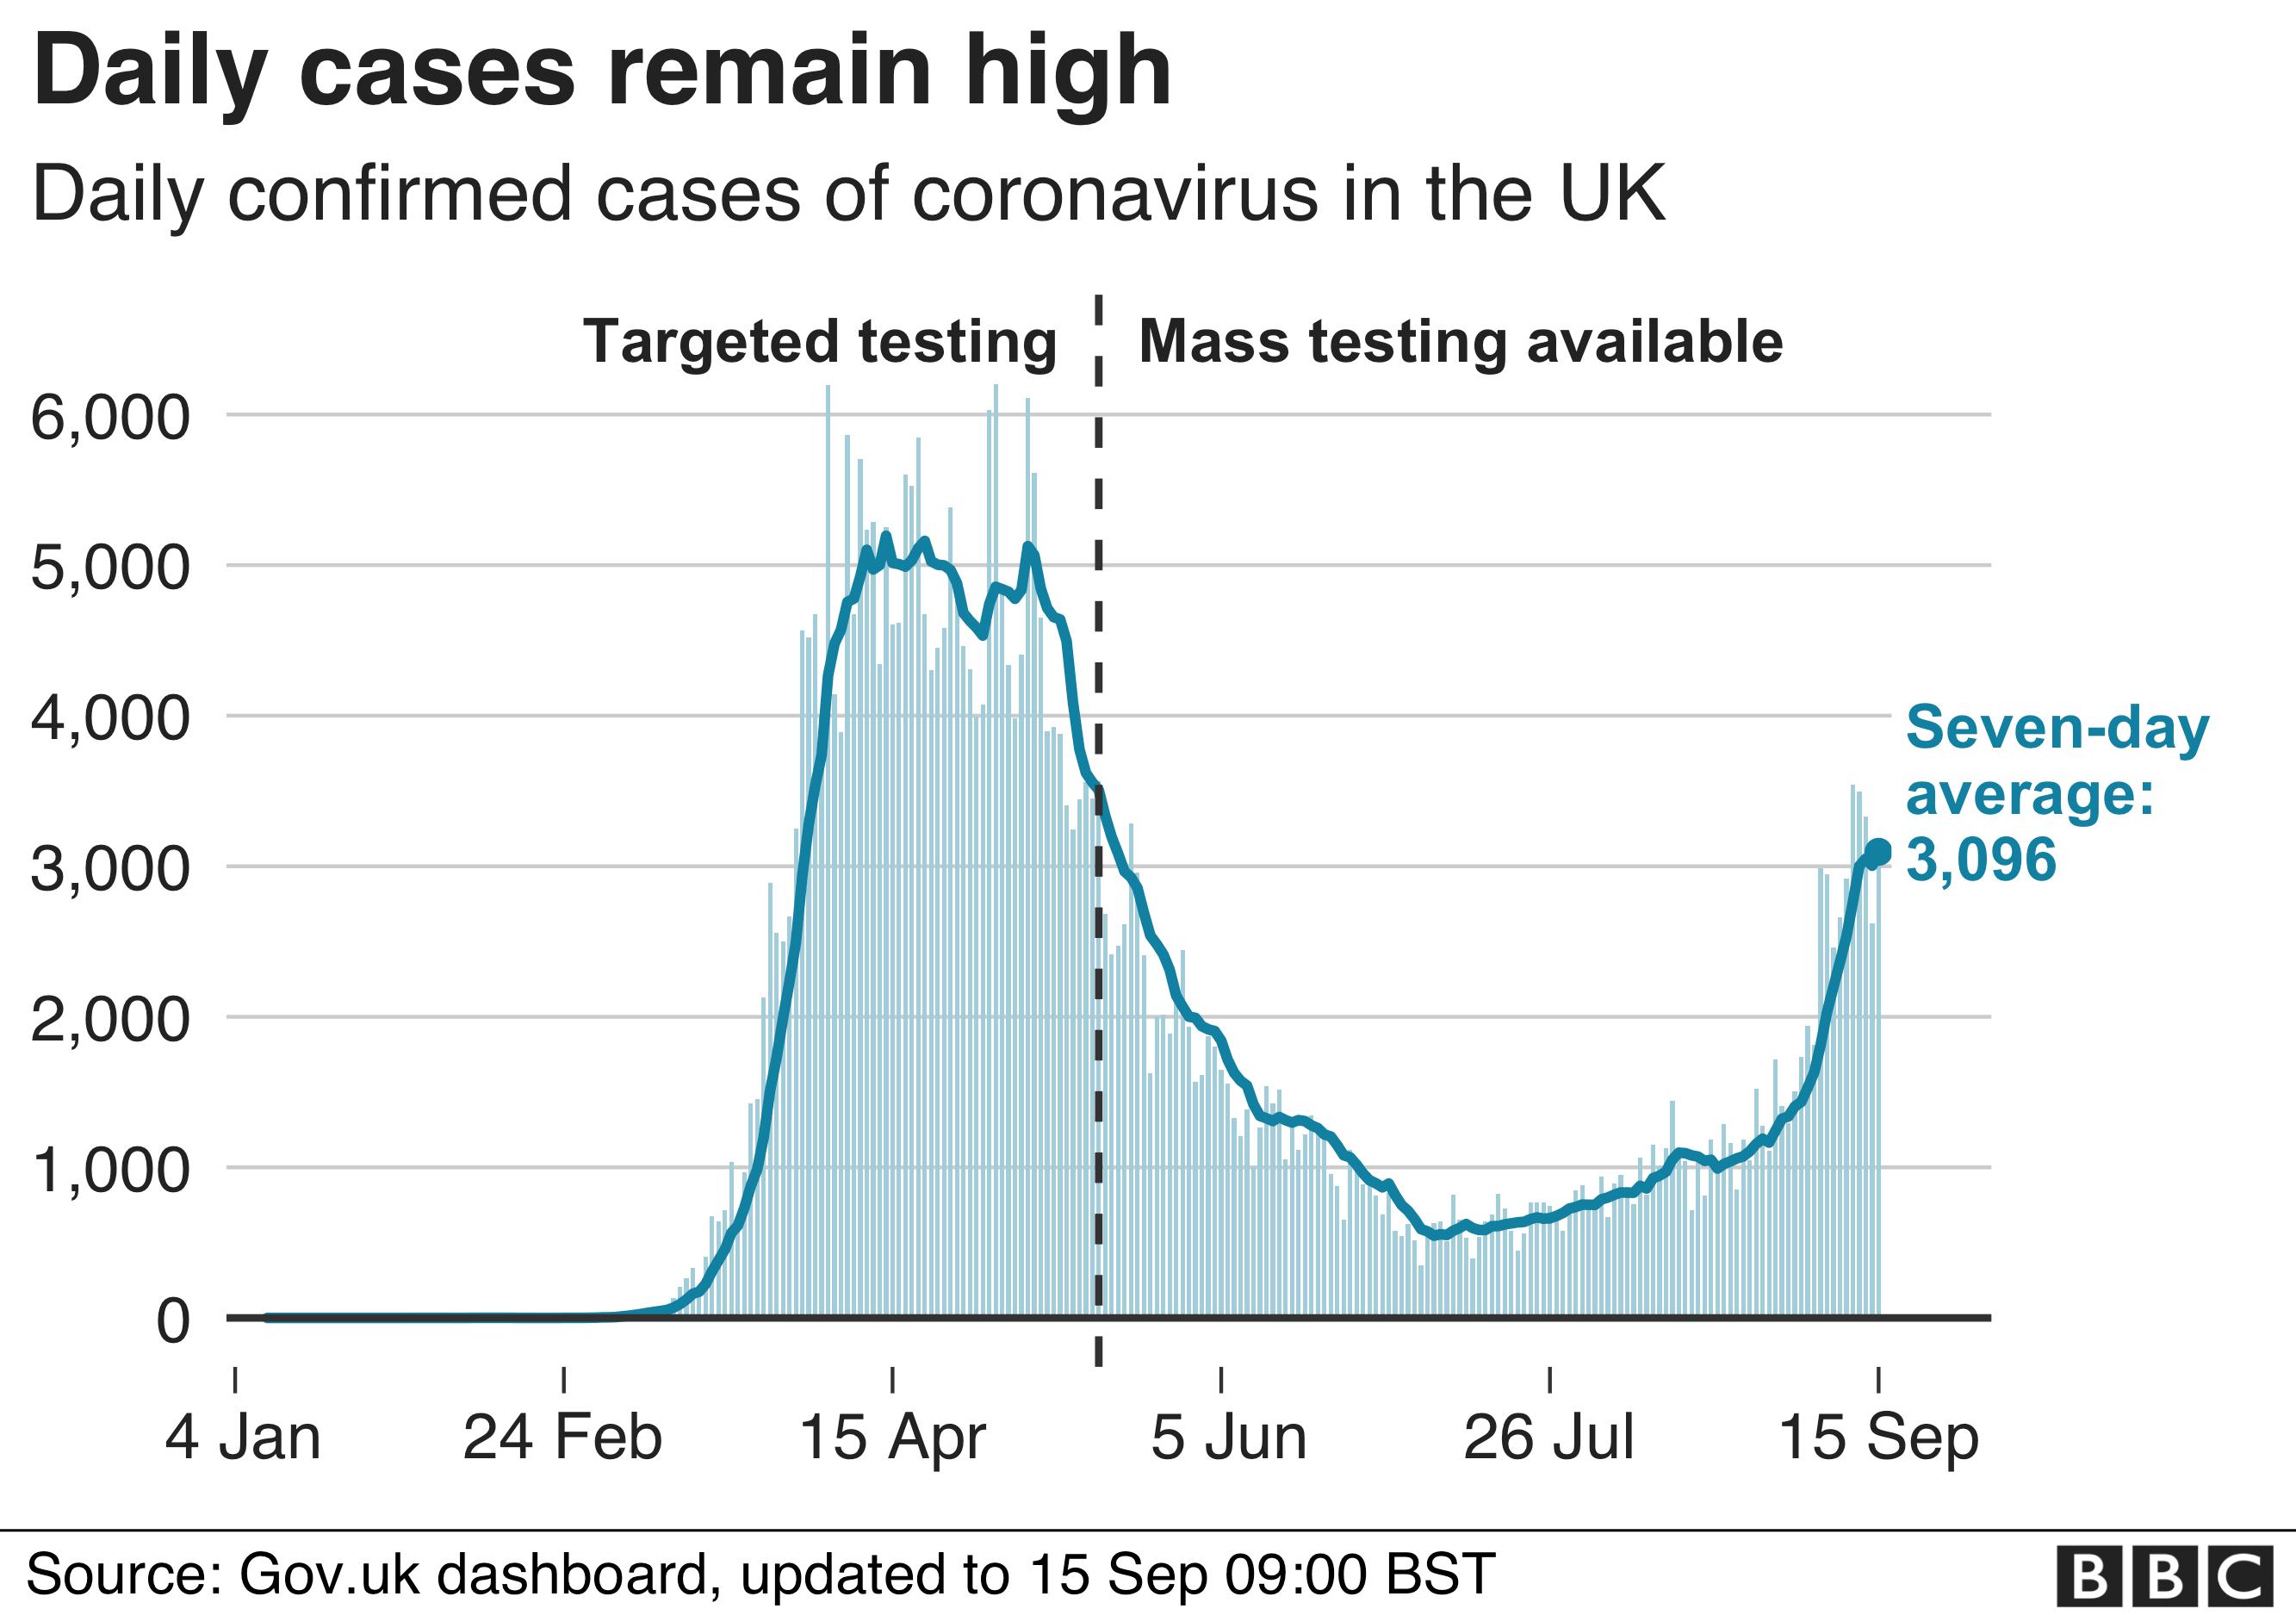 Chart showing daily coronavirus cases remain high